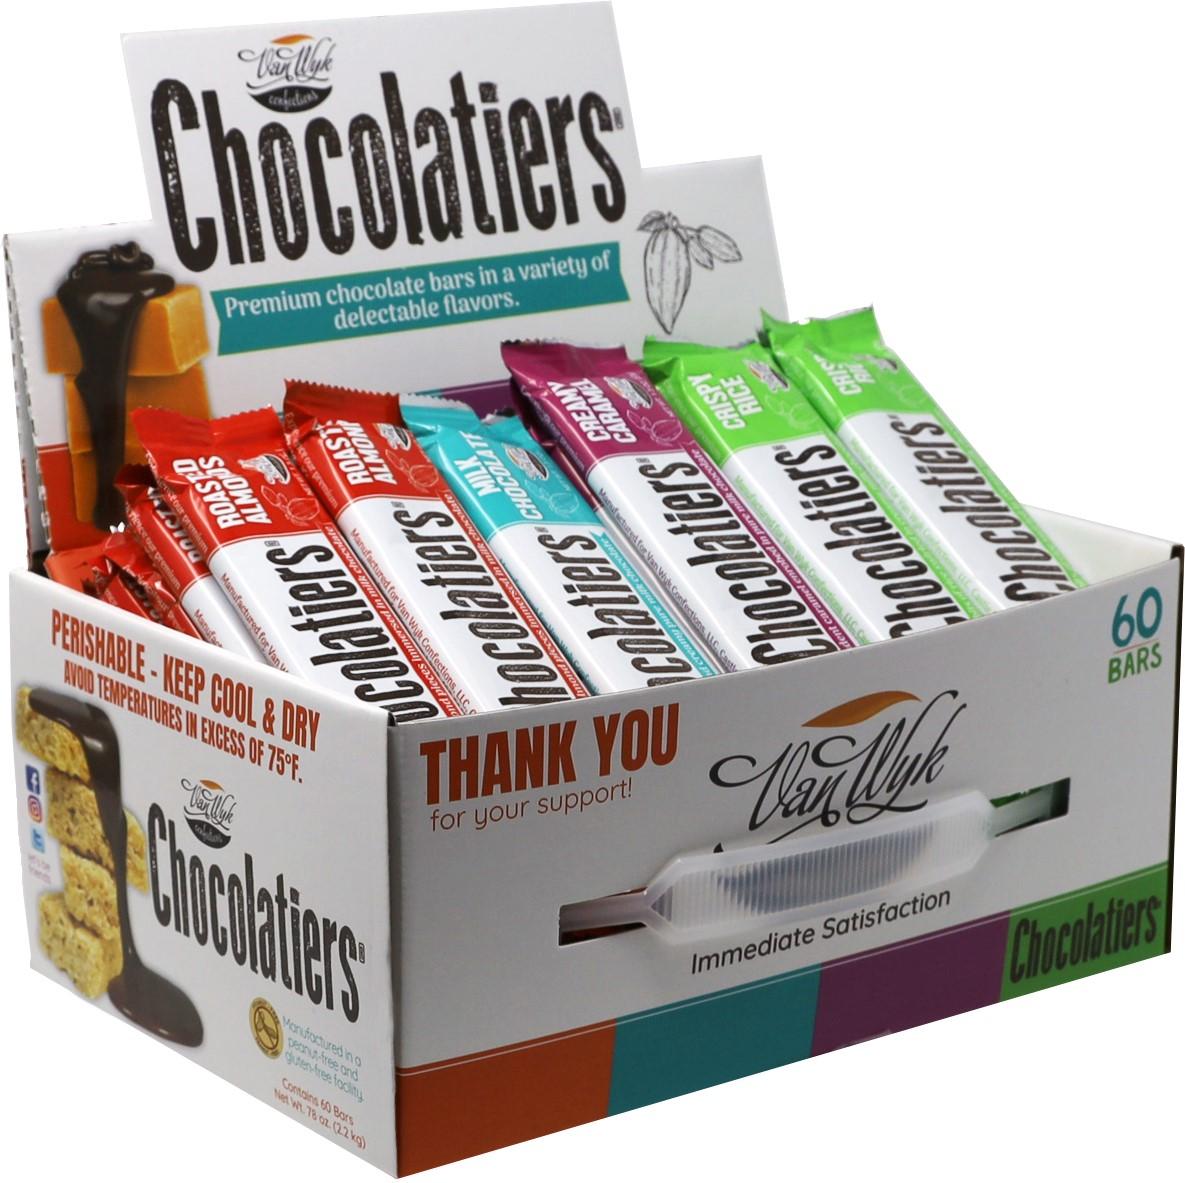 $1 Chocolatiers Fundraiser